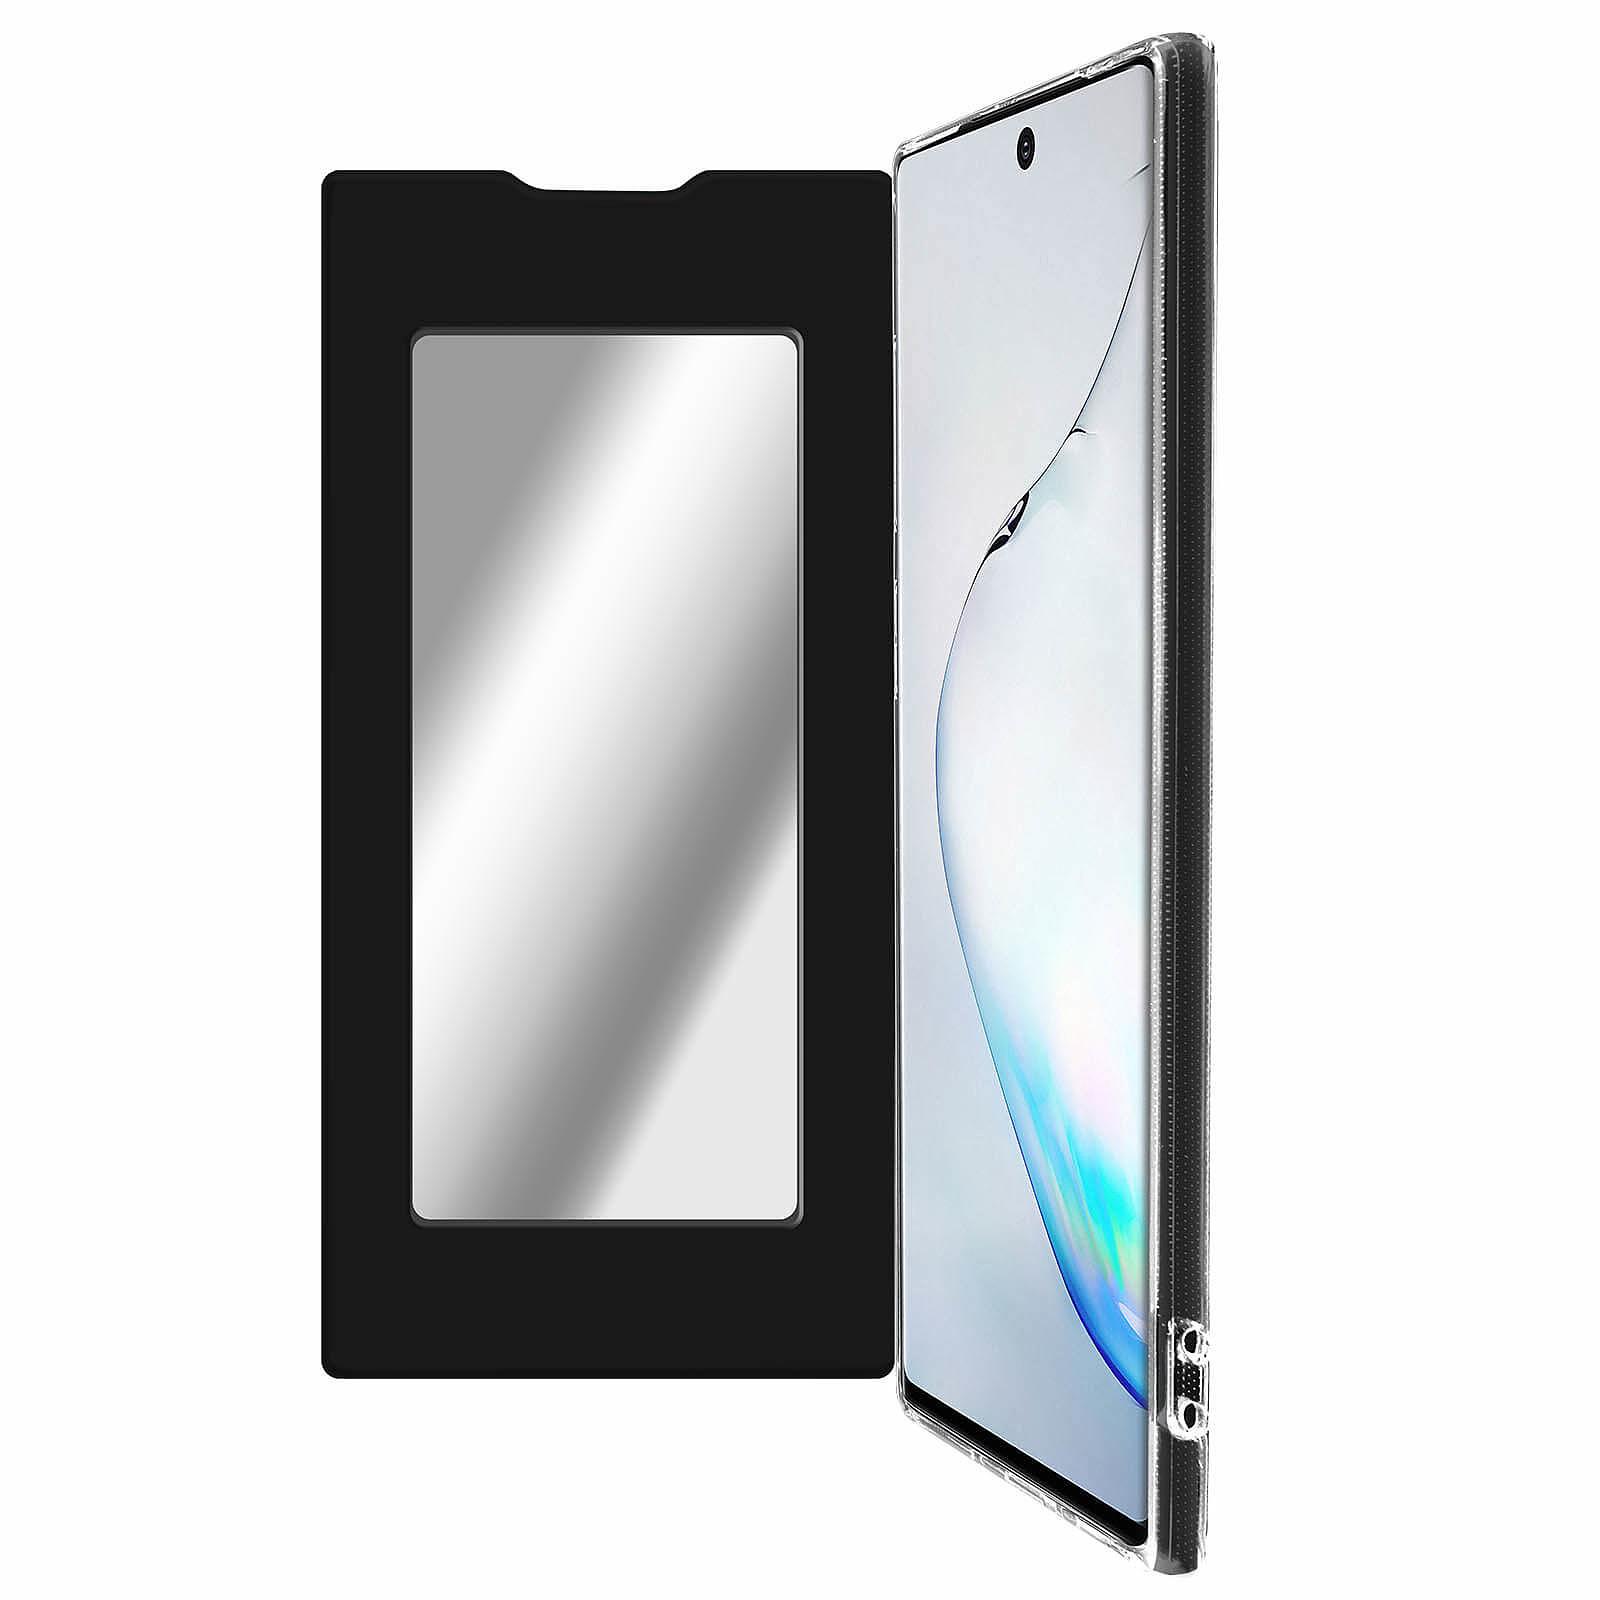 Avizar Etui folio Noir Miroir pour Samsung Galaxy Note 10